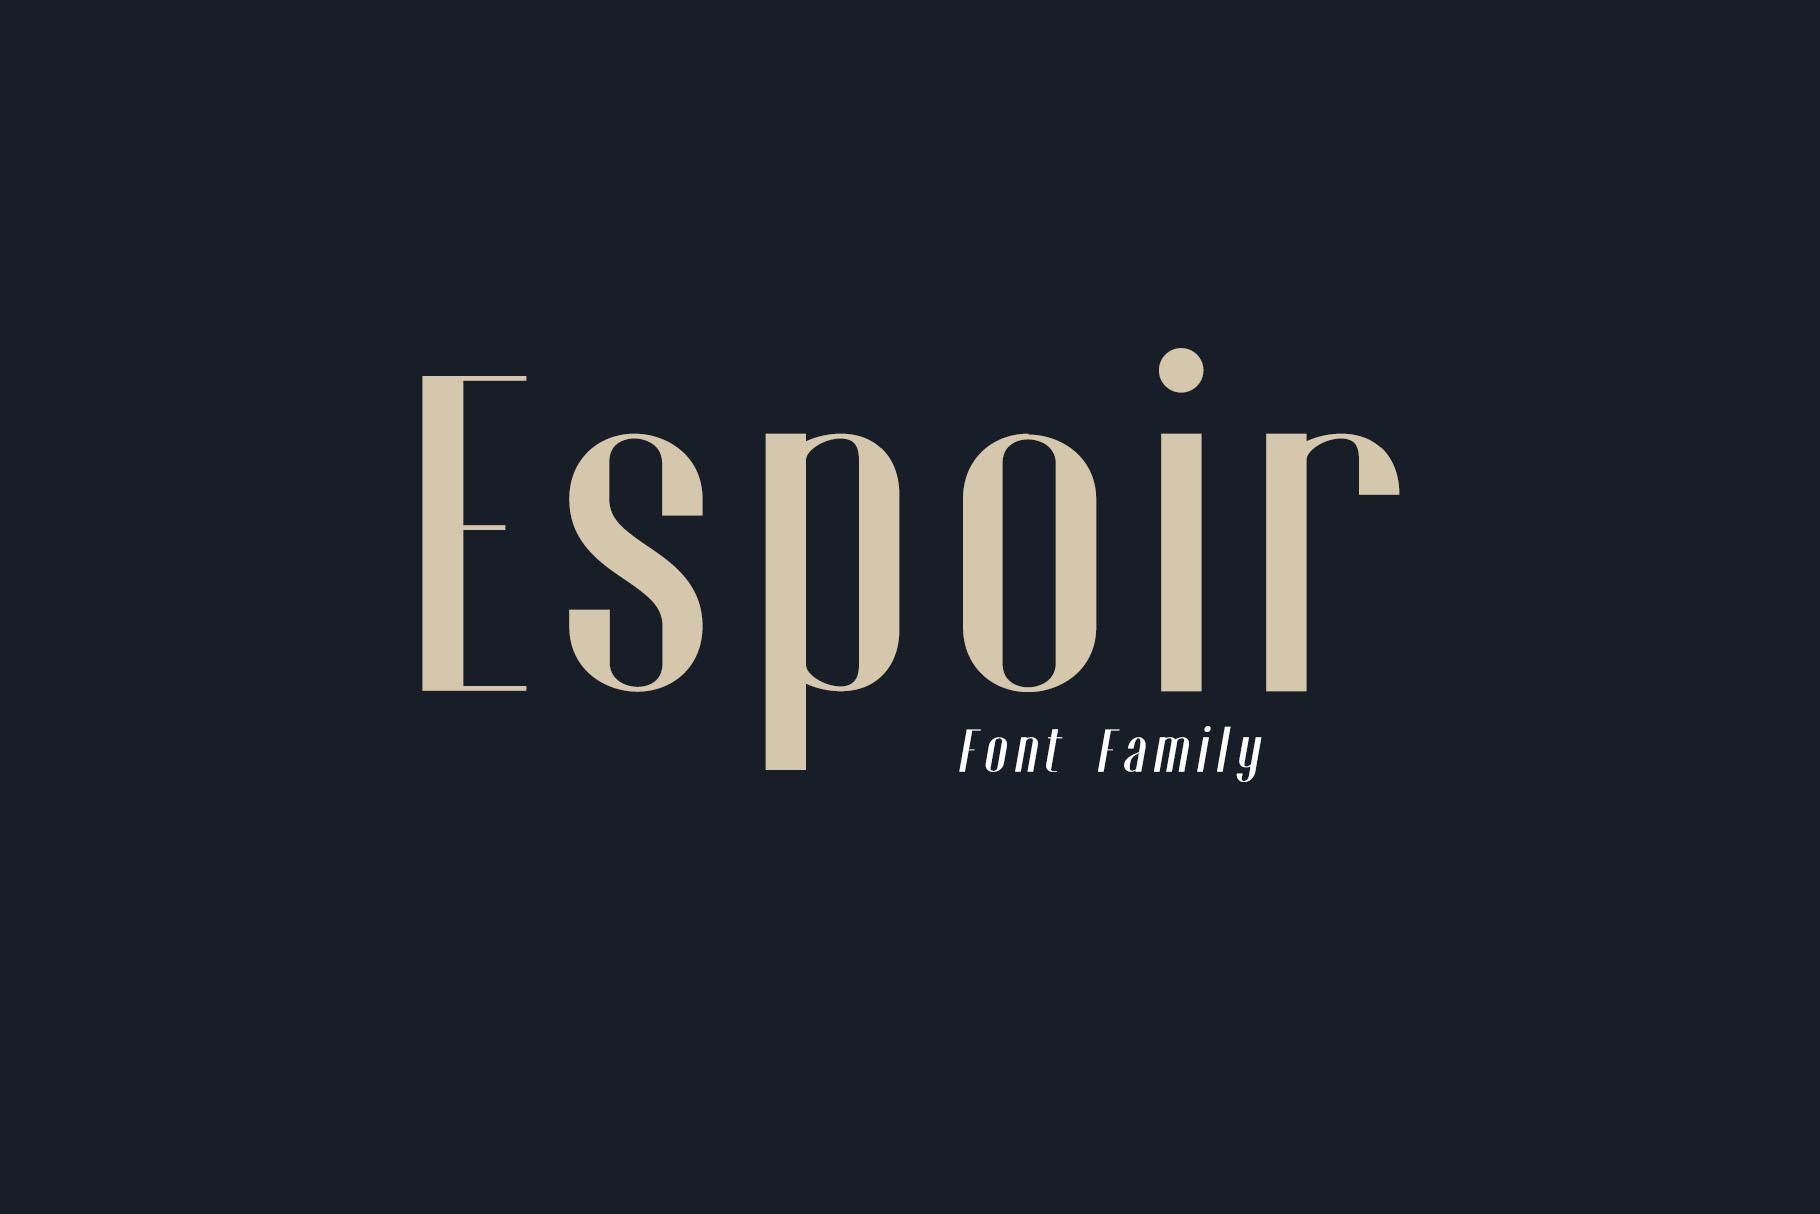 Espoir Font Family example image 1